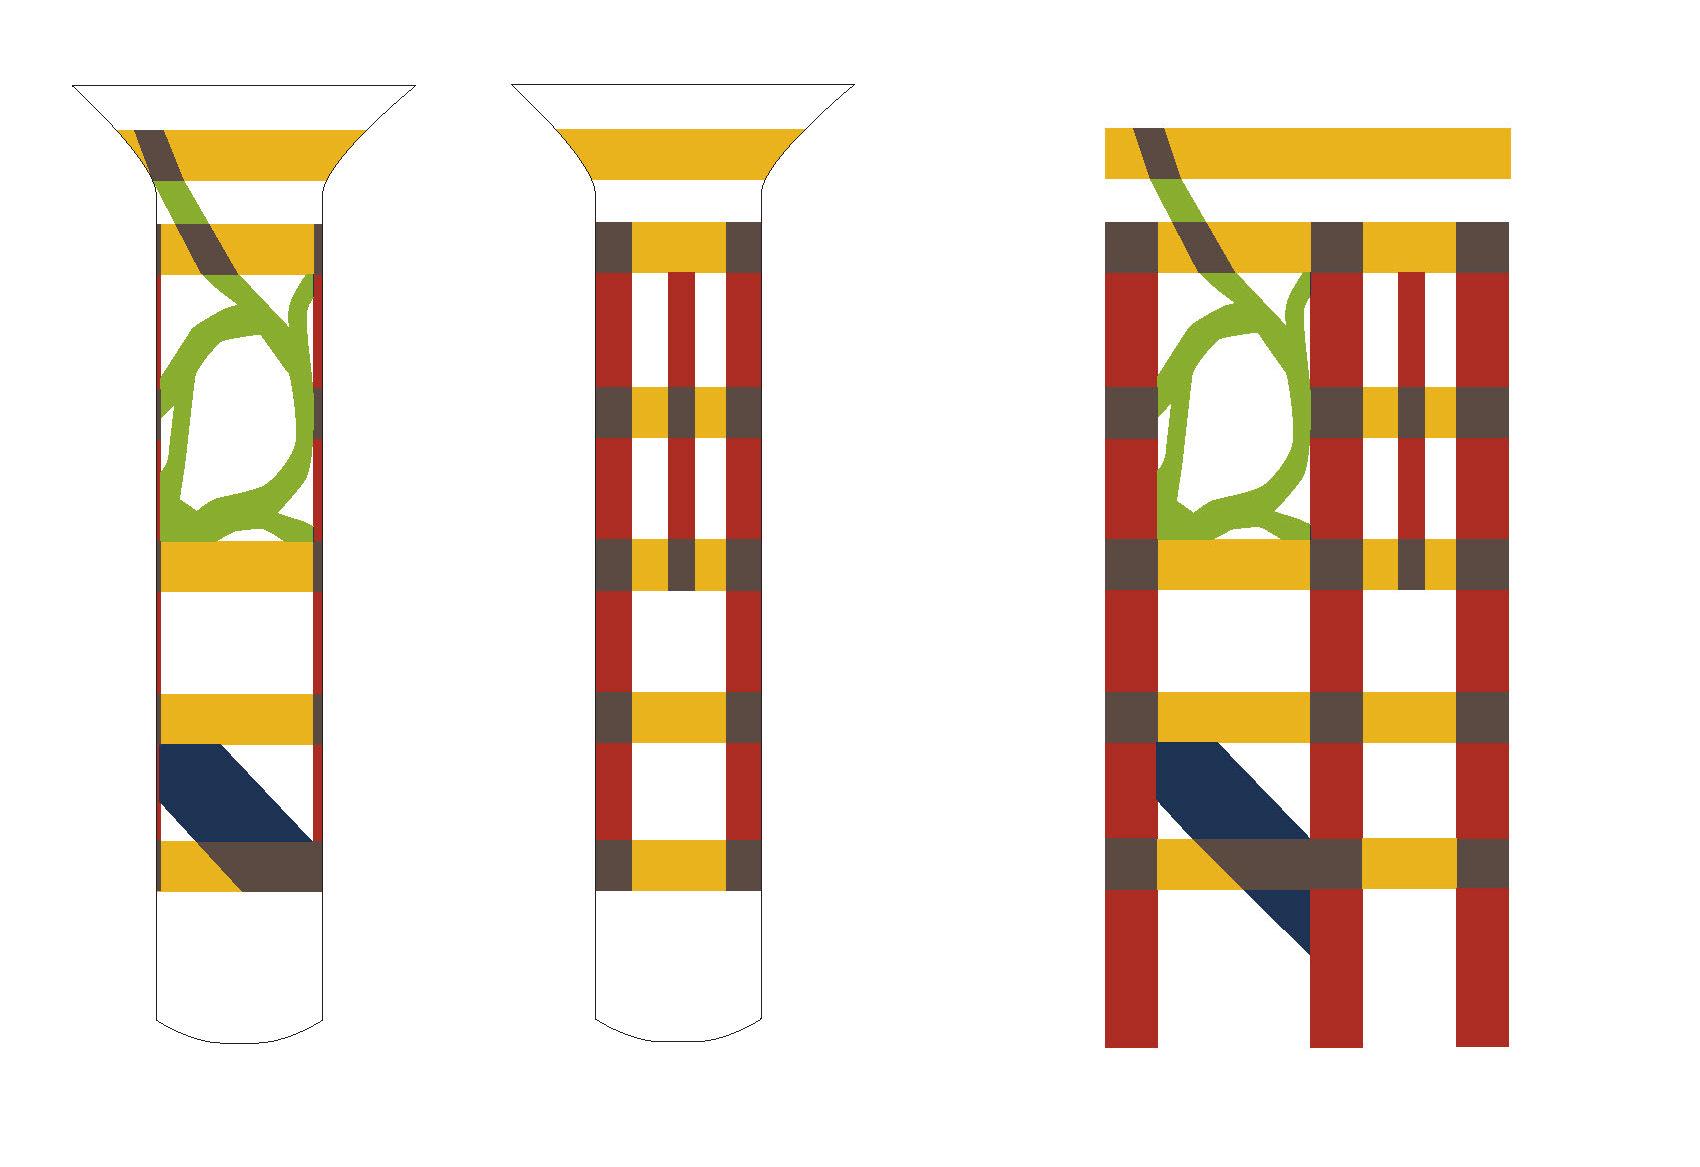 Glo columns suwbay_multi-color2.jpg